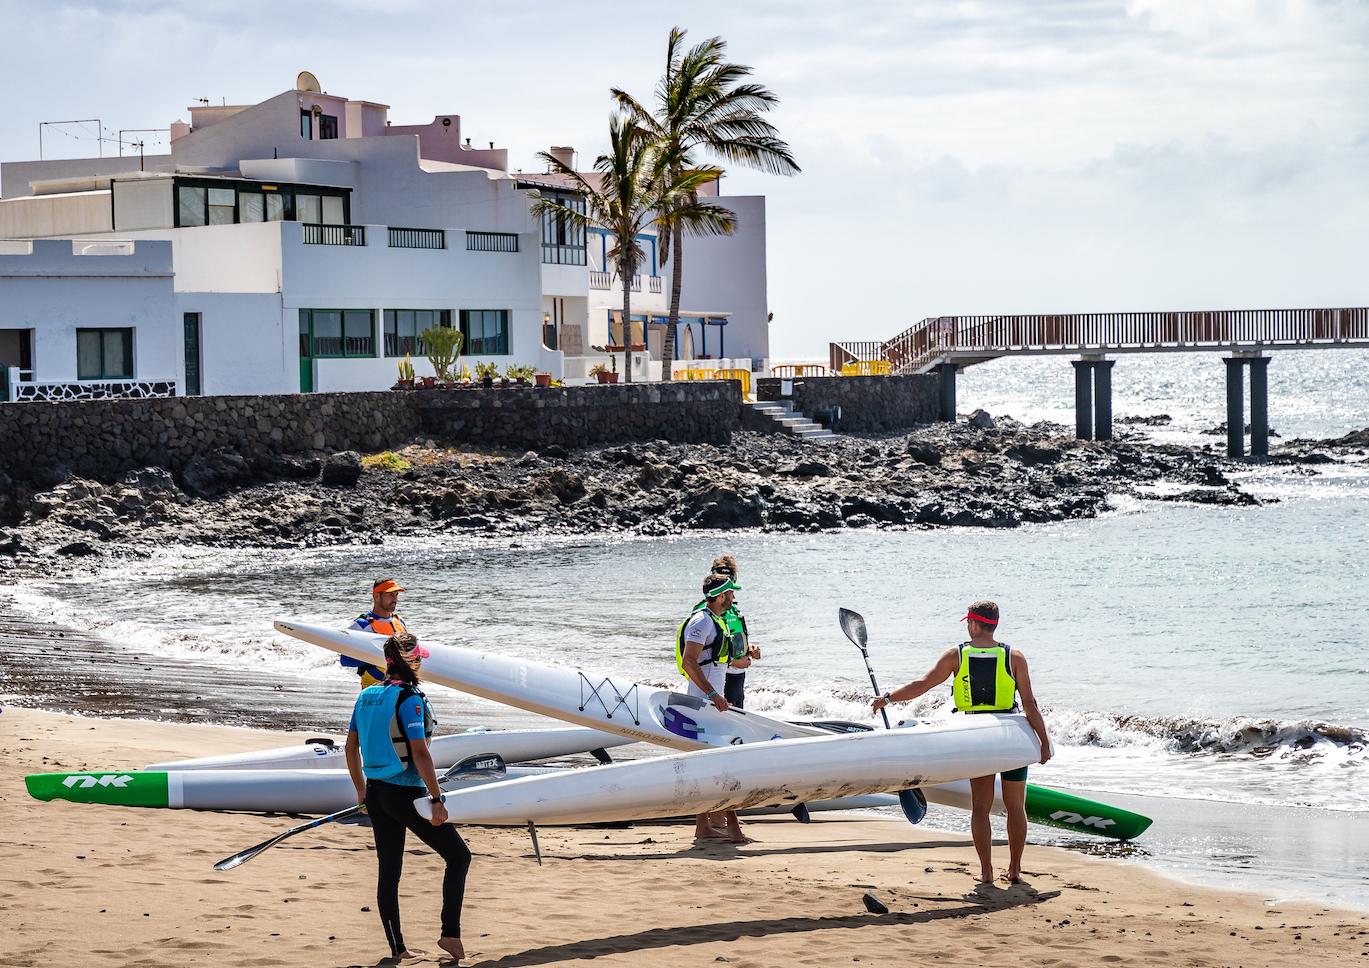 ICF Canoe Ocean Racing World Championships Lanzarote2021